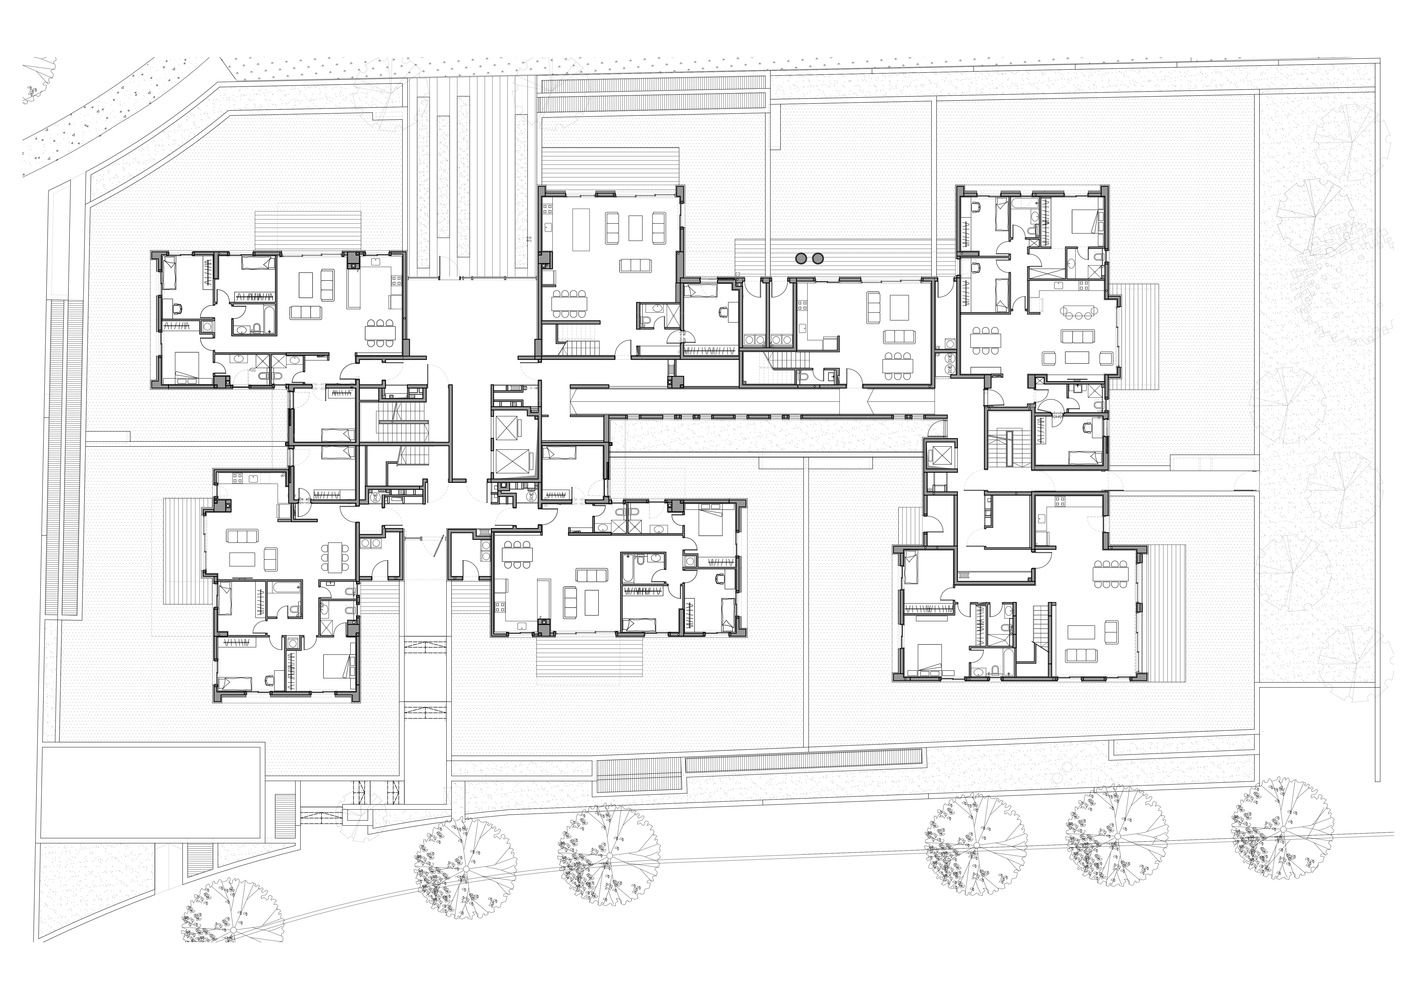 Gallery of 22 Haganim st. Ramat Ha\'sharon / Bar Orian Architects - 19